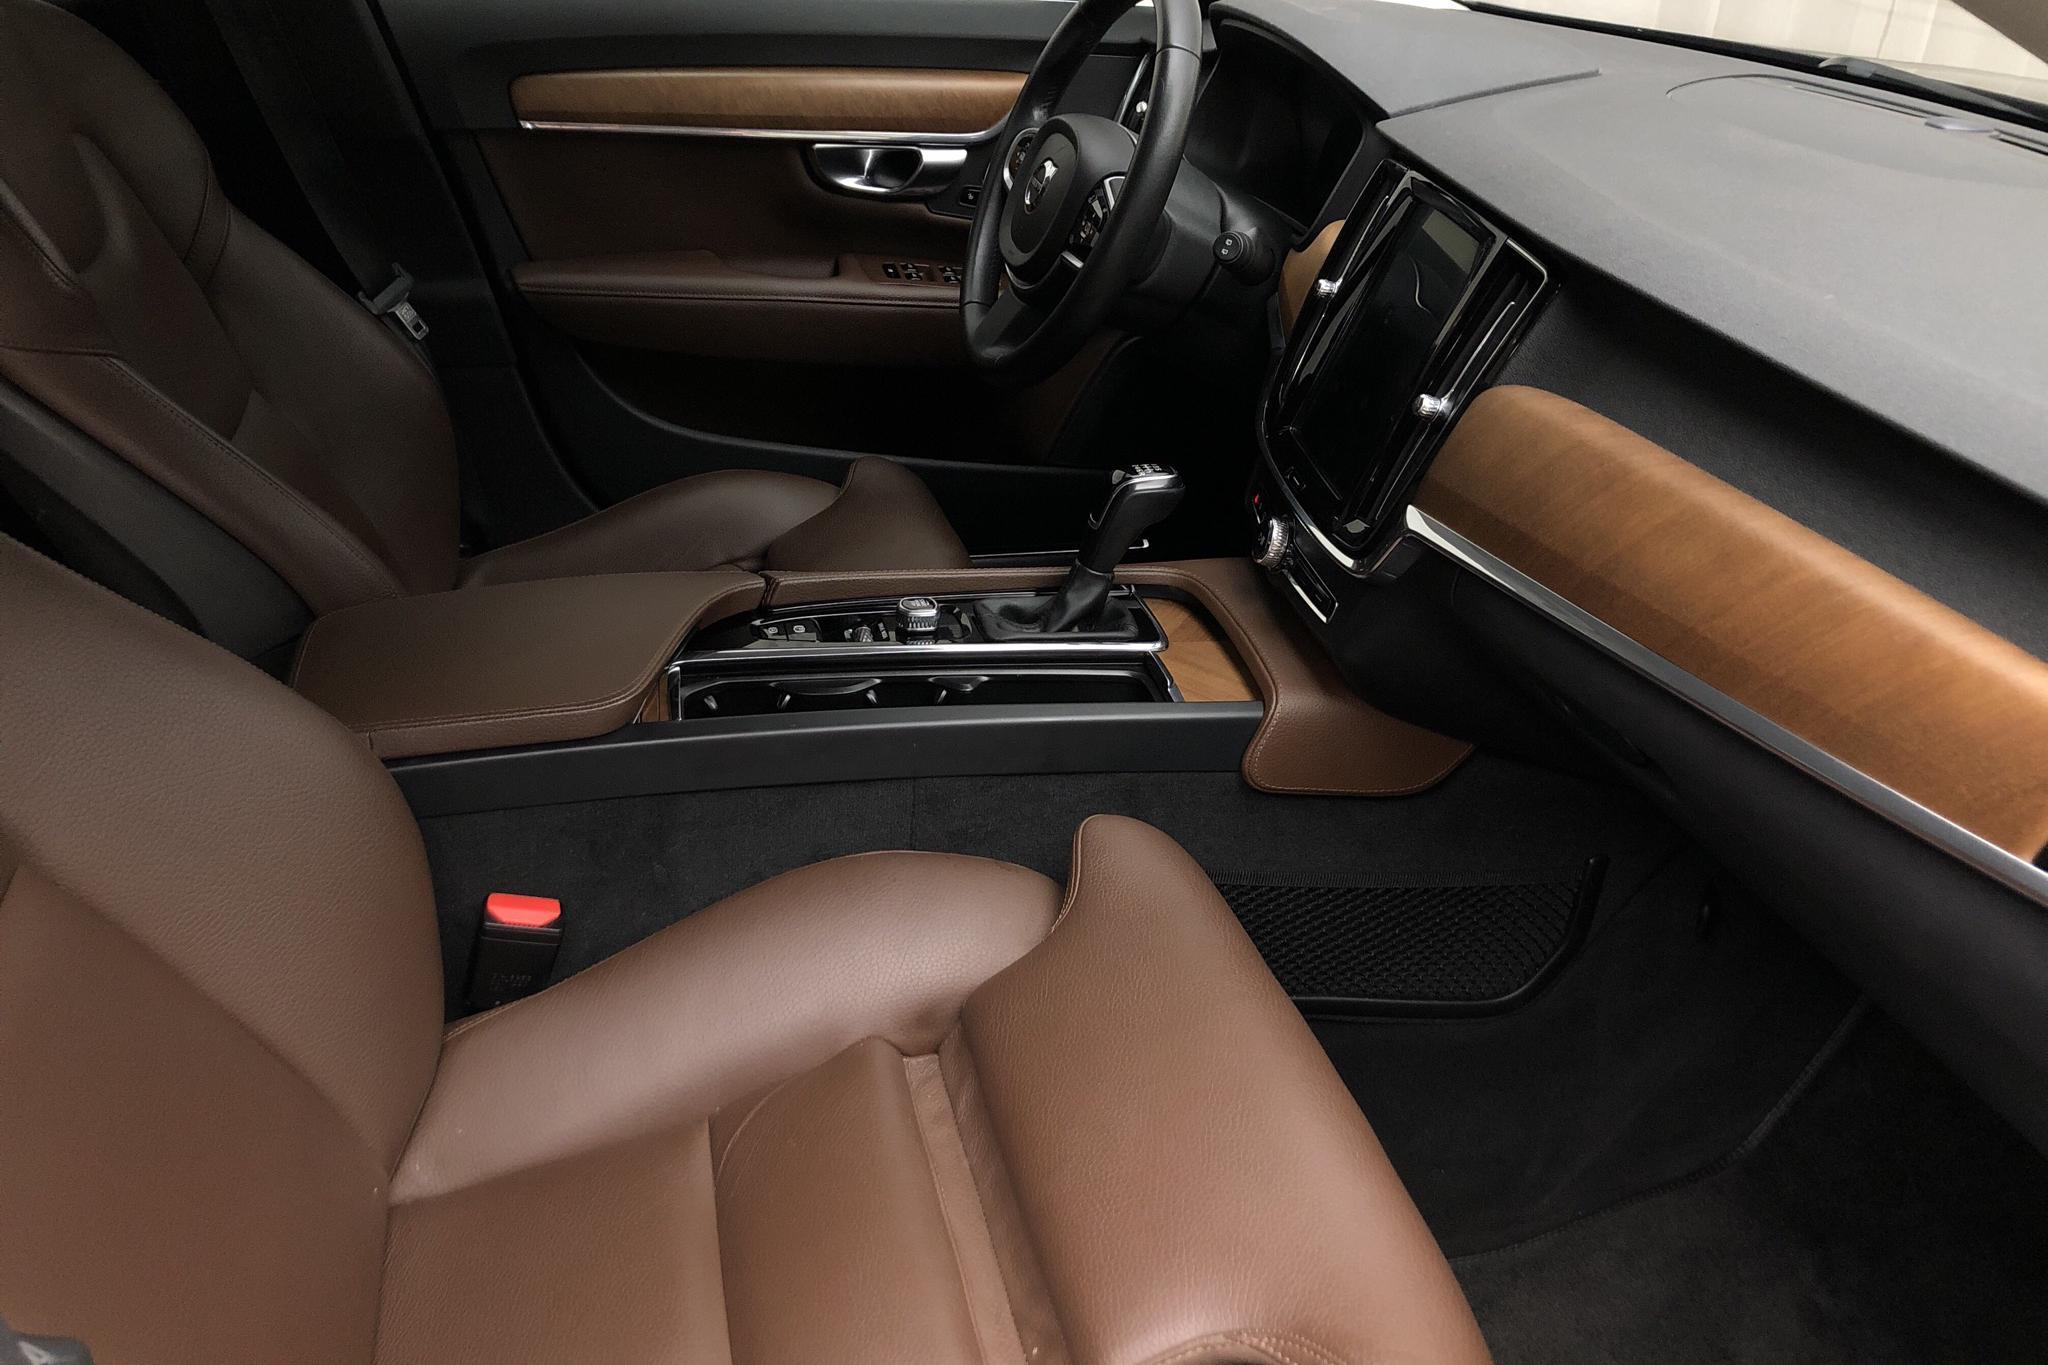 Volvo V90 D3 (150hk) - 9 573 mil - Manuell - svart - 2018